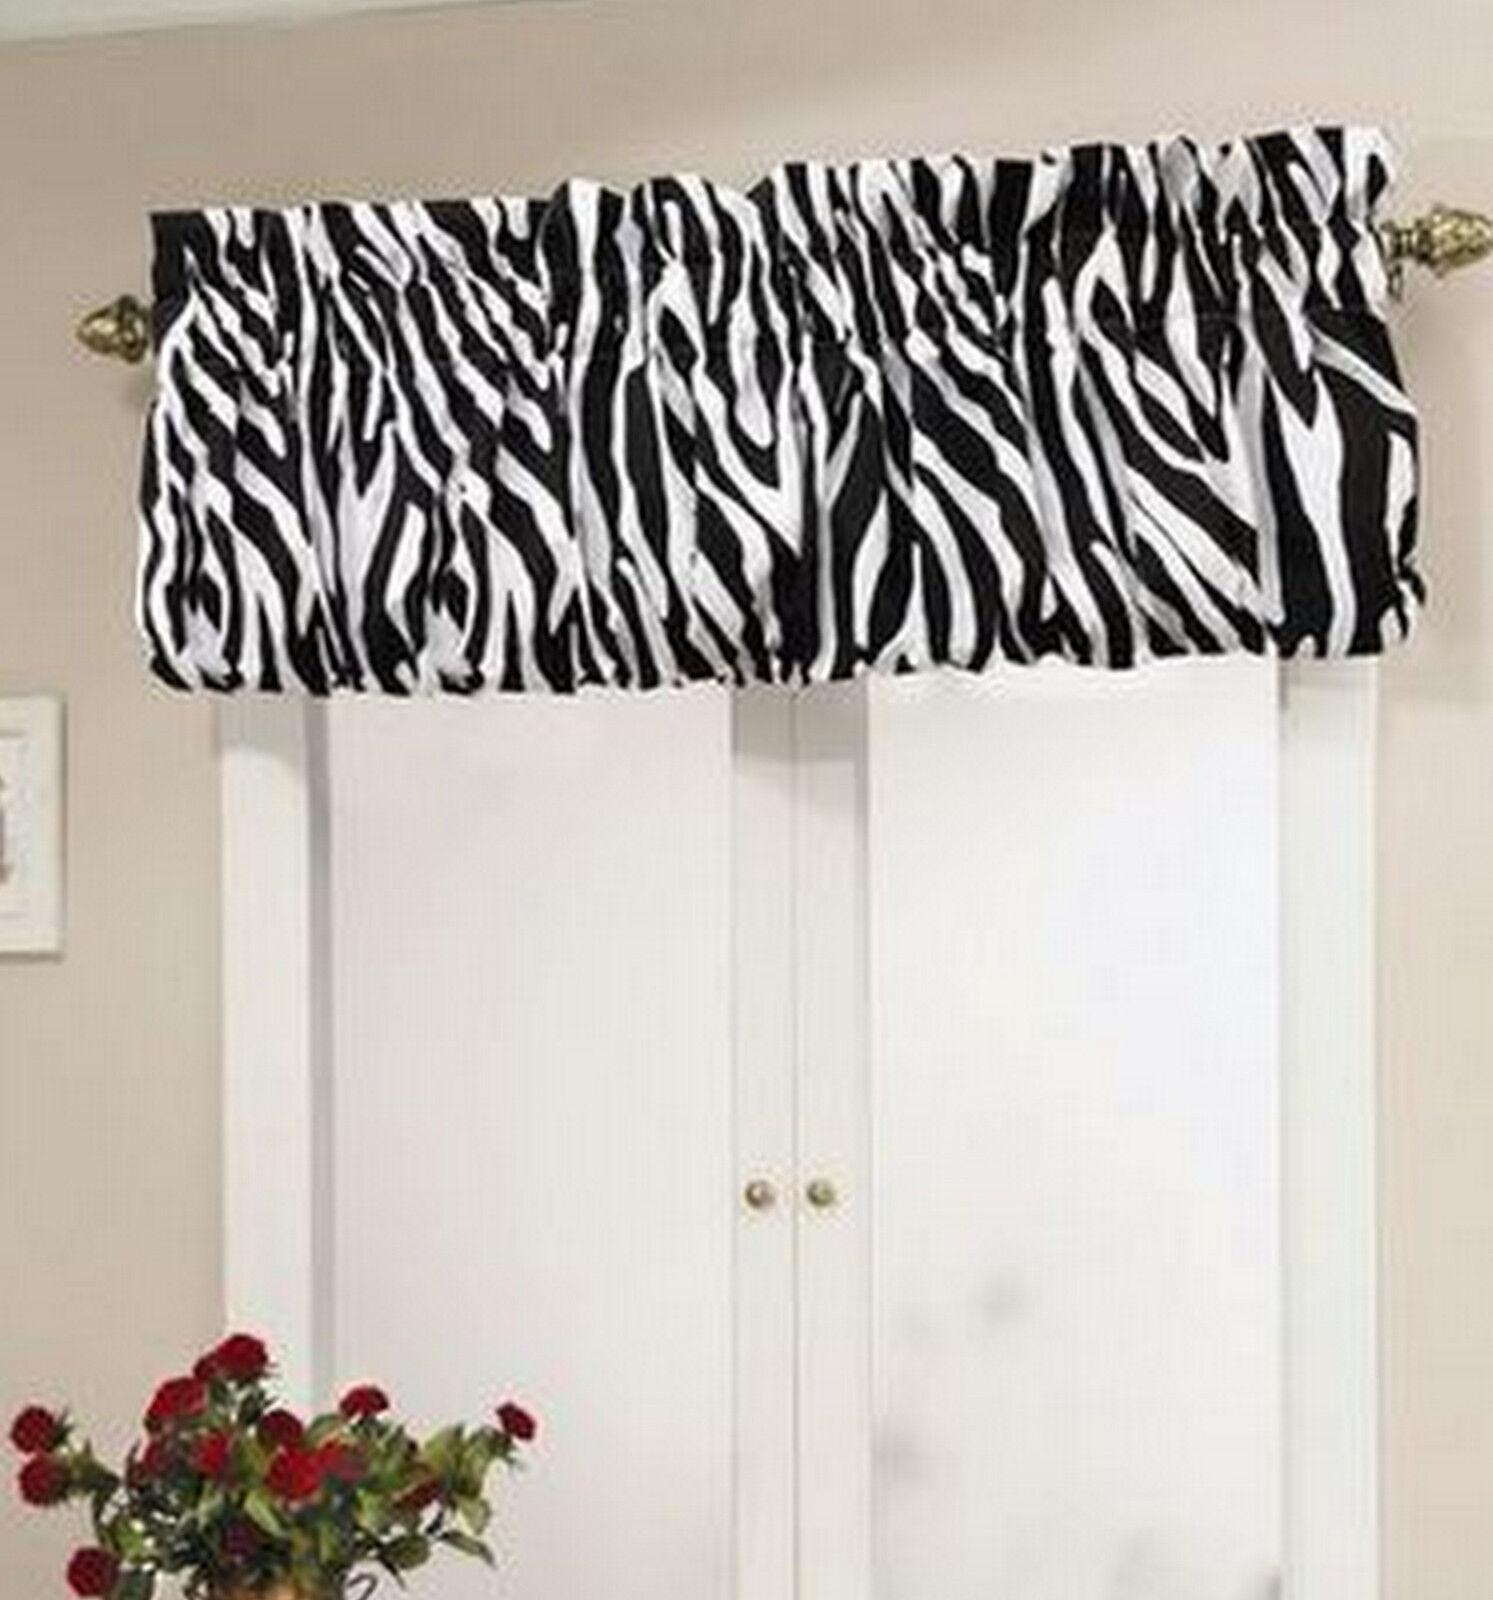 Top It Off Zebra Window Valance Trendy Design Size 72